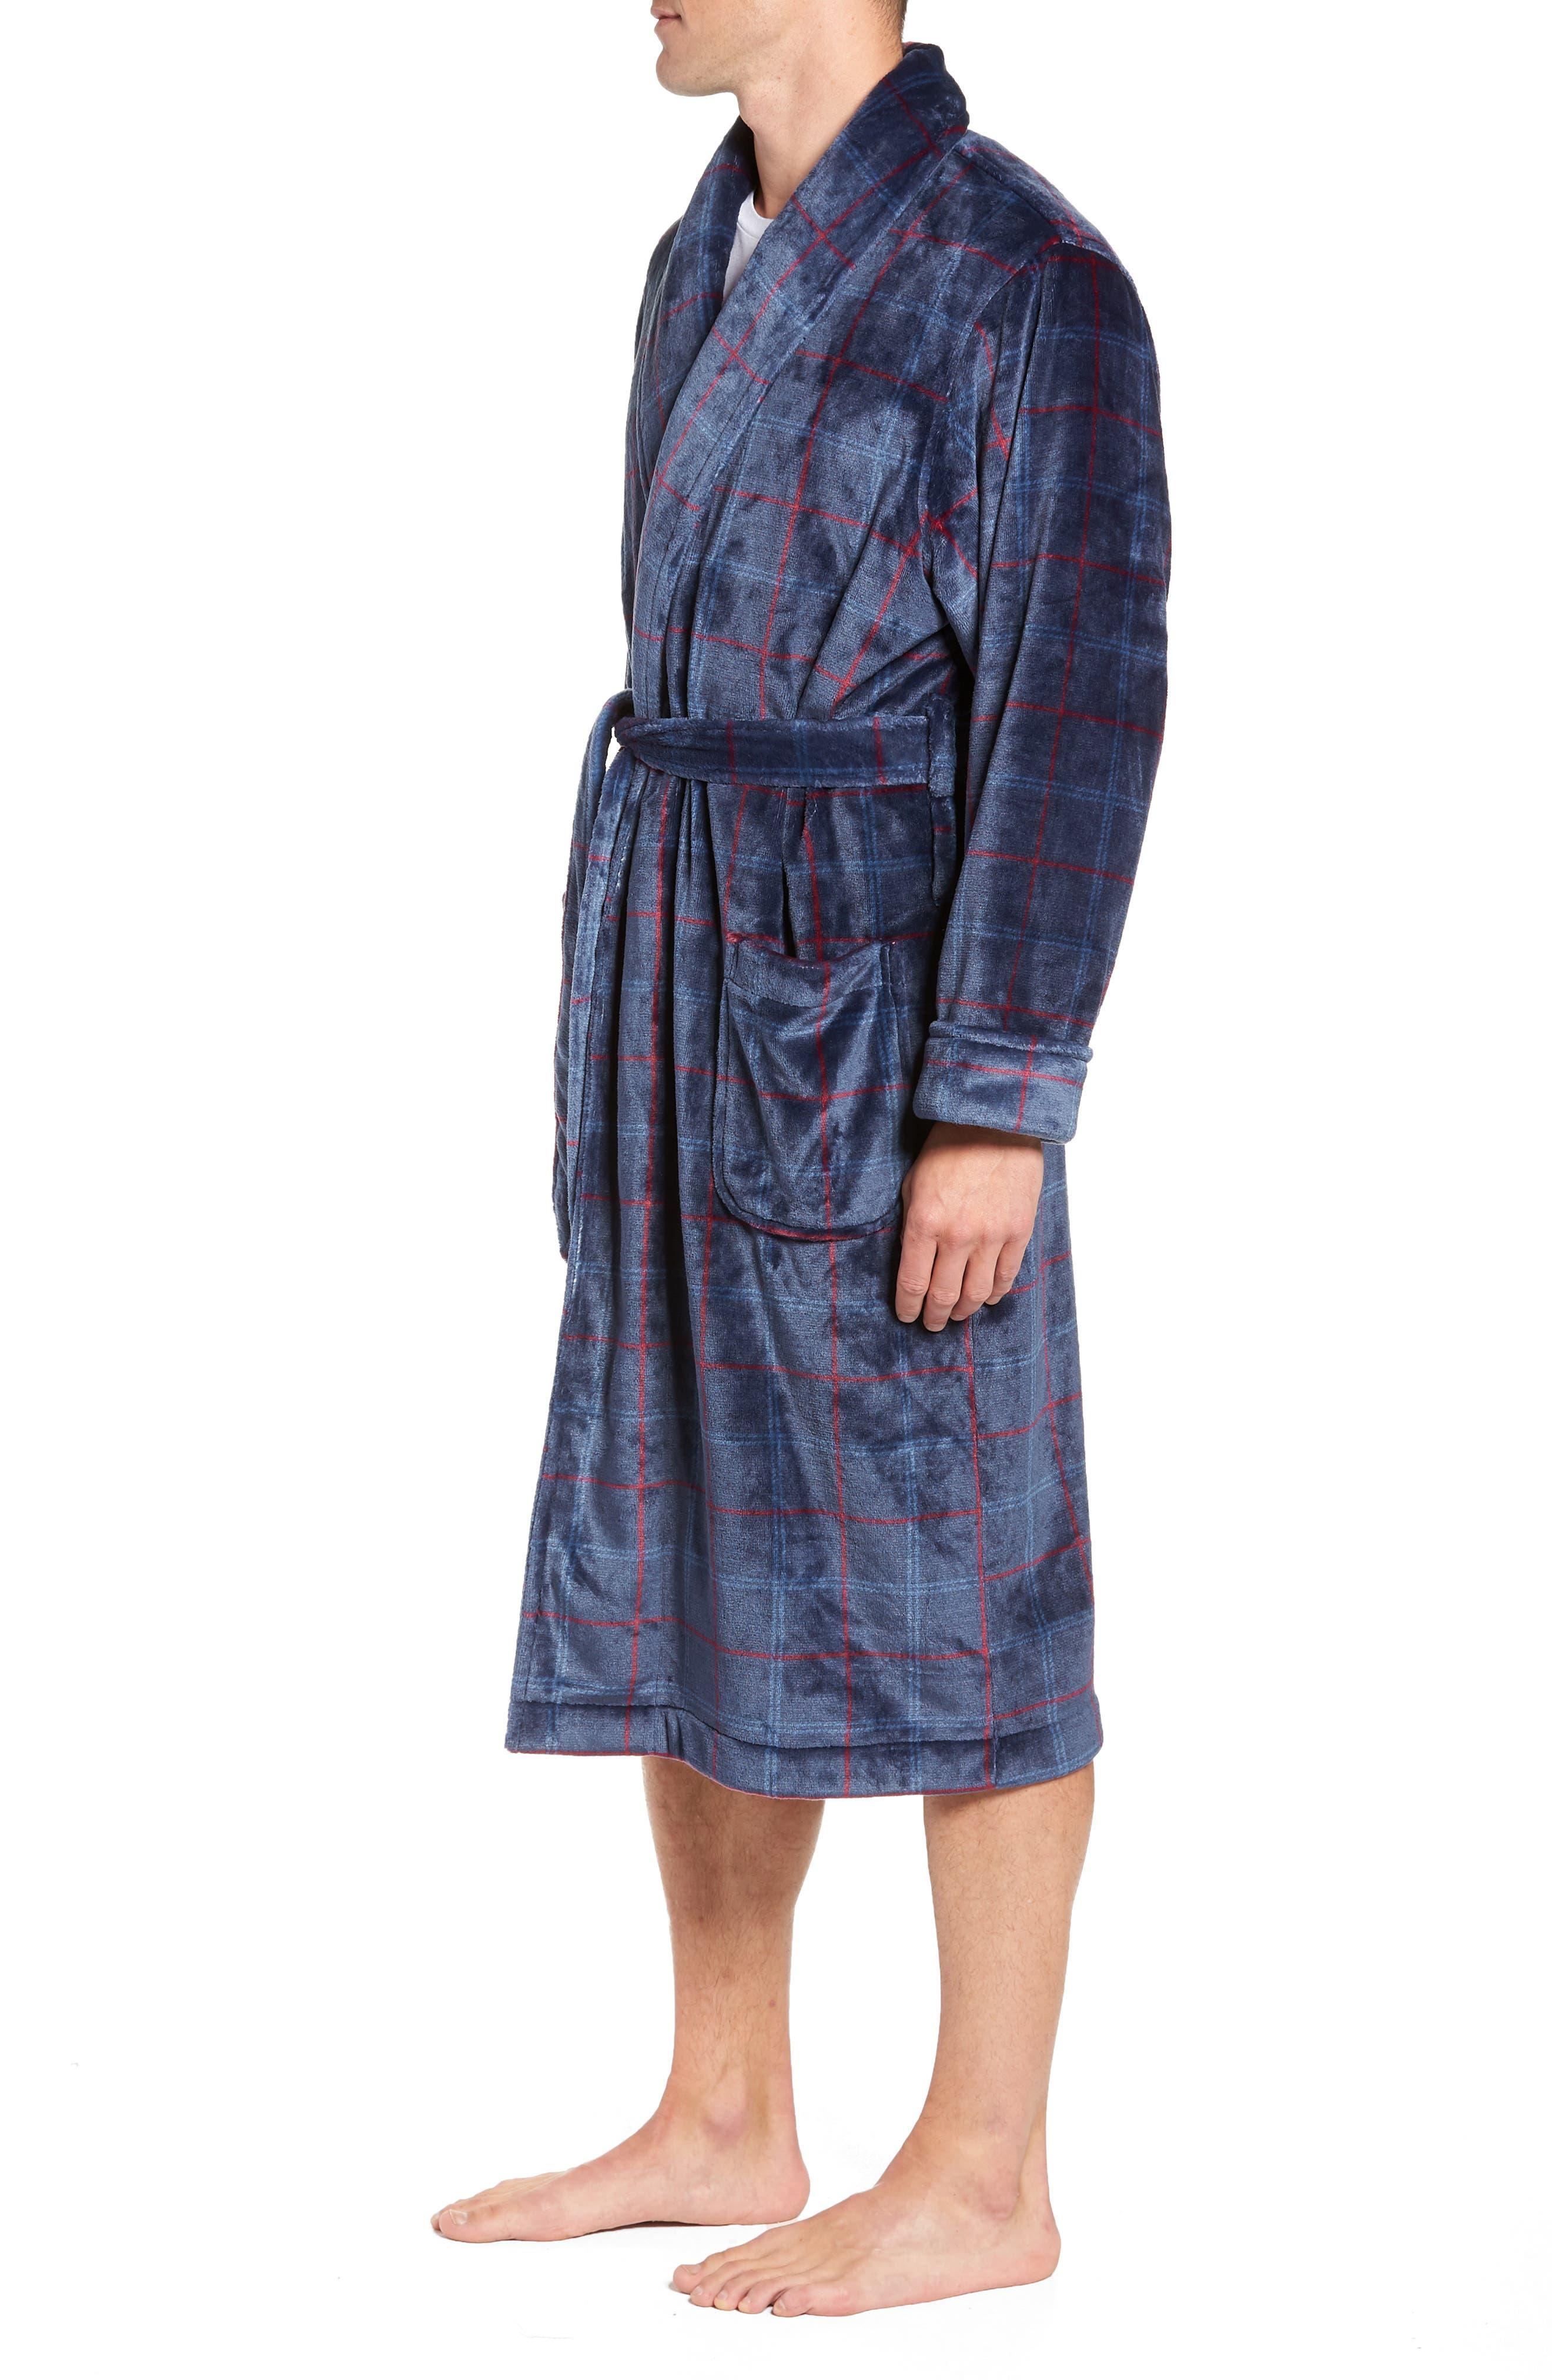 Windowpane Fleece Robe,                             Alternate thumbnail 3, color,                             NAVY -RED WINDOWPANE